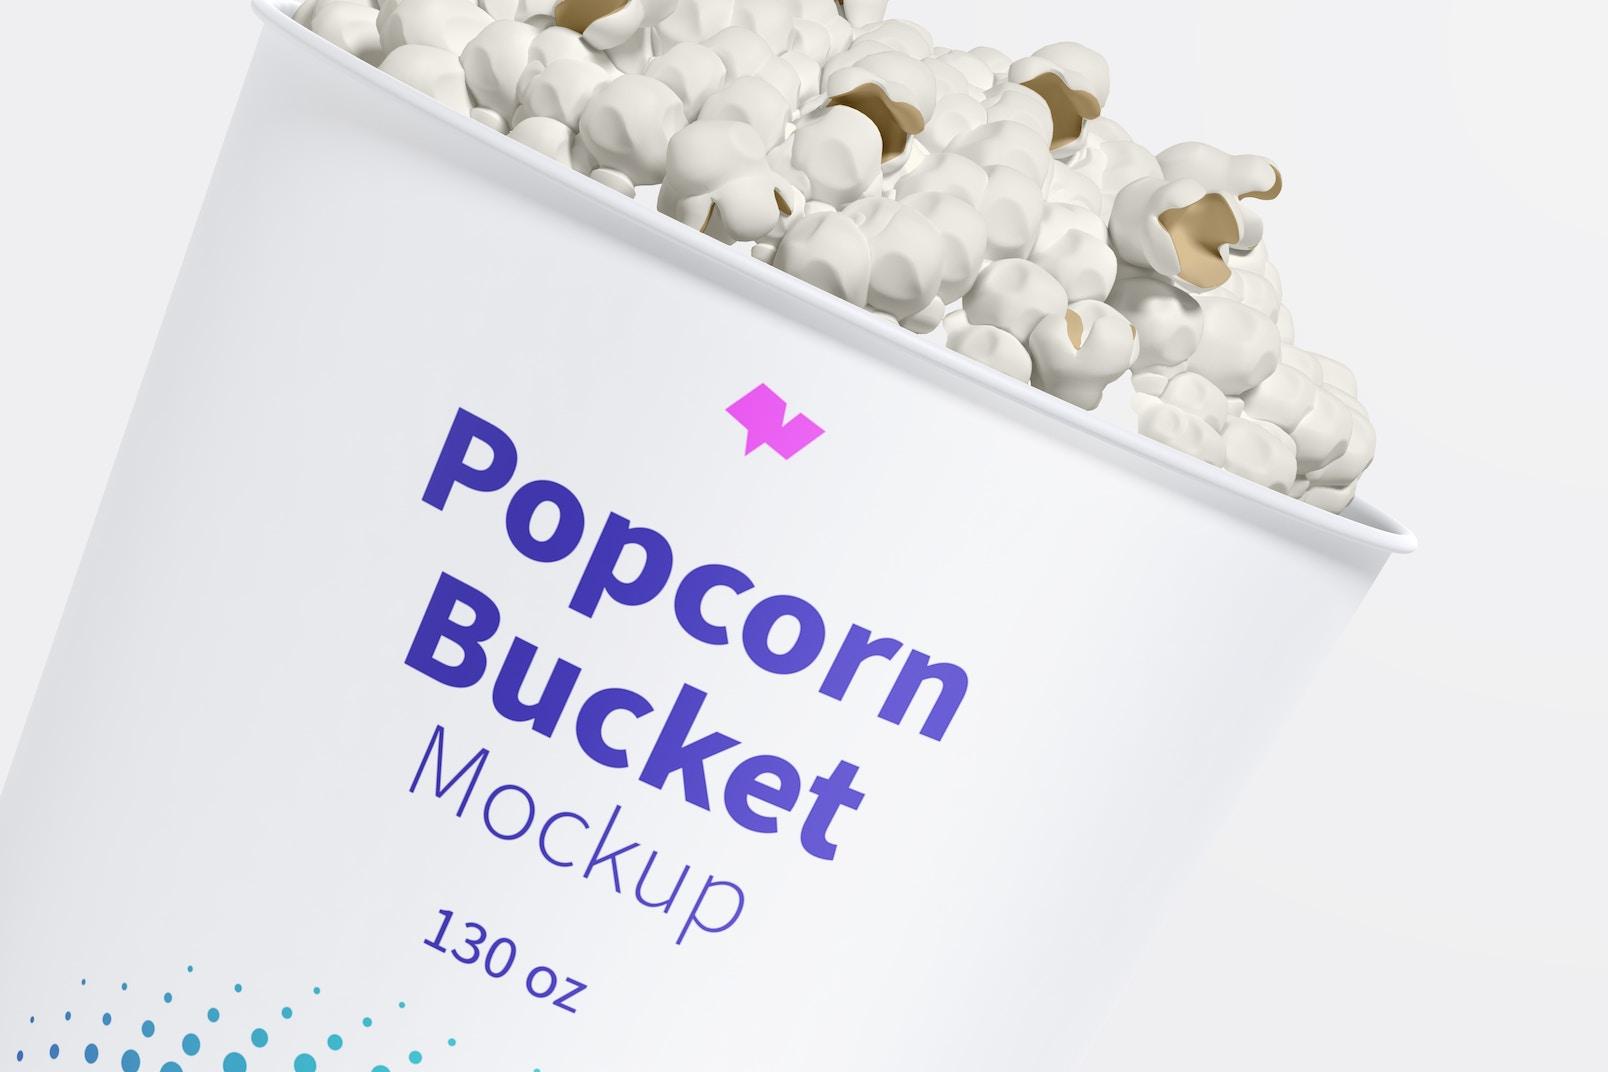 130 oz Popcorn Bucket Mockup, Close-Up